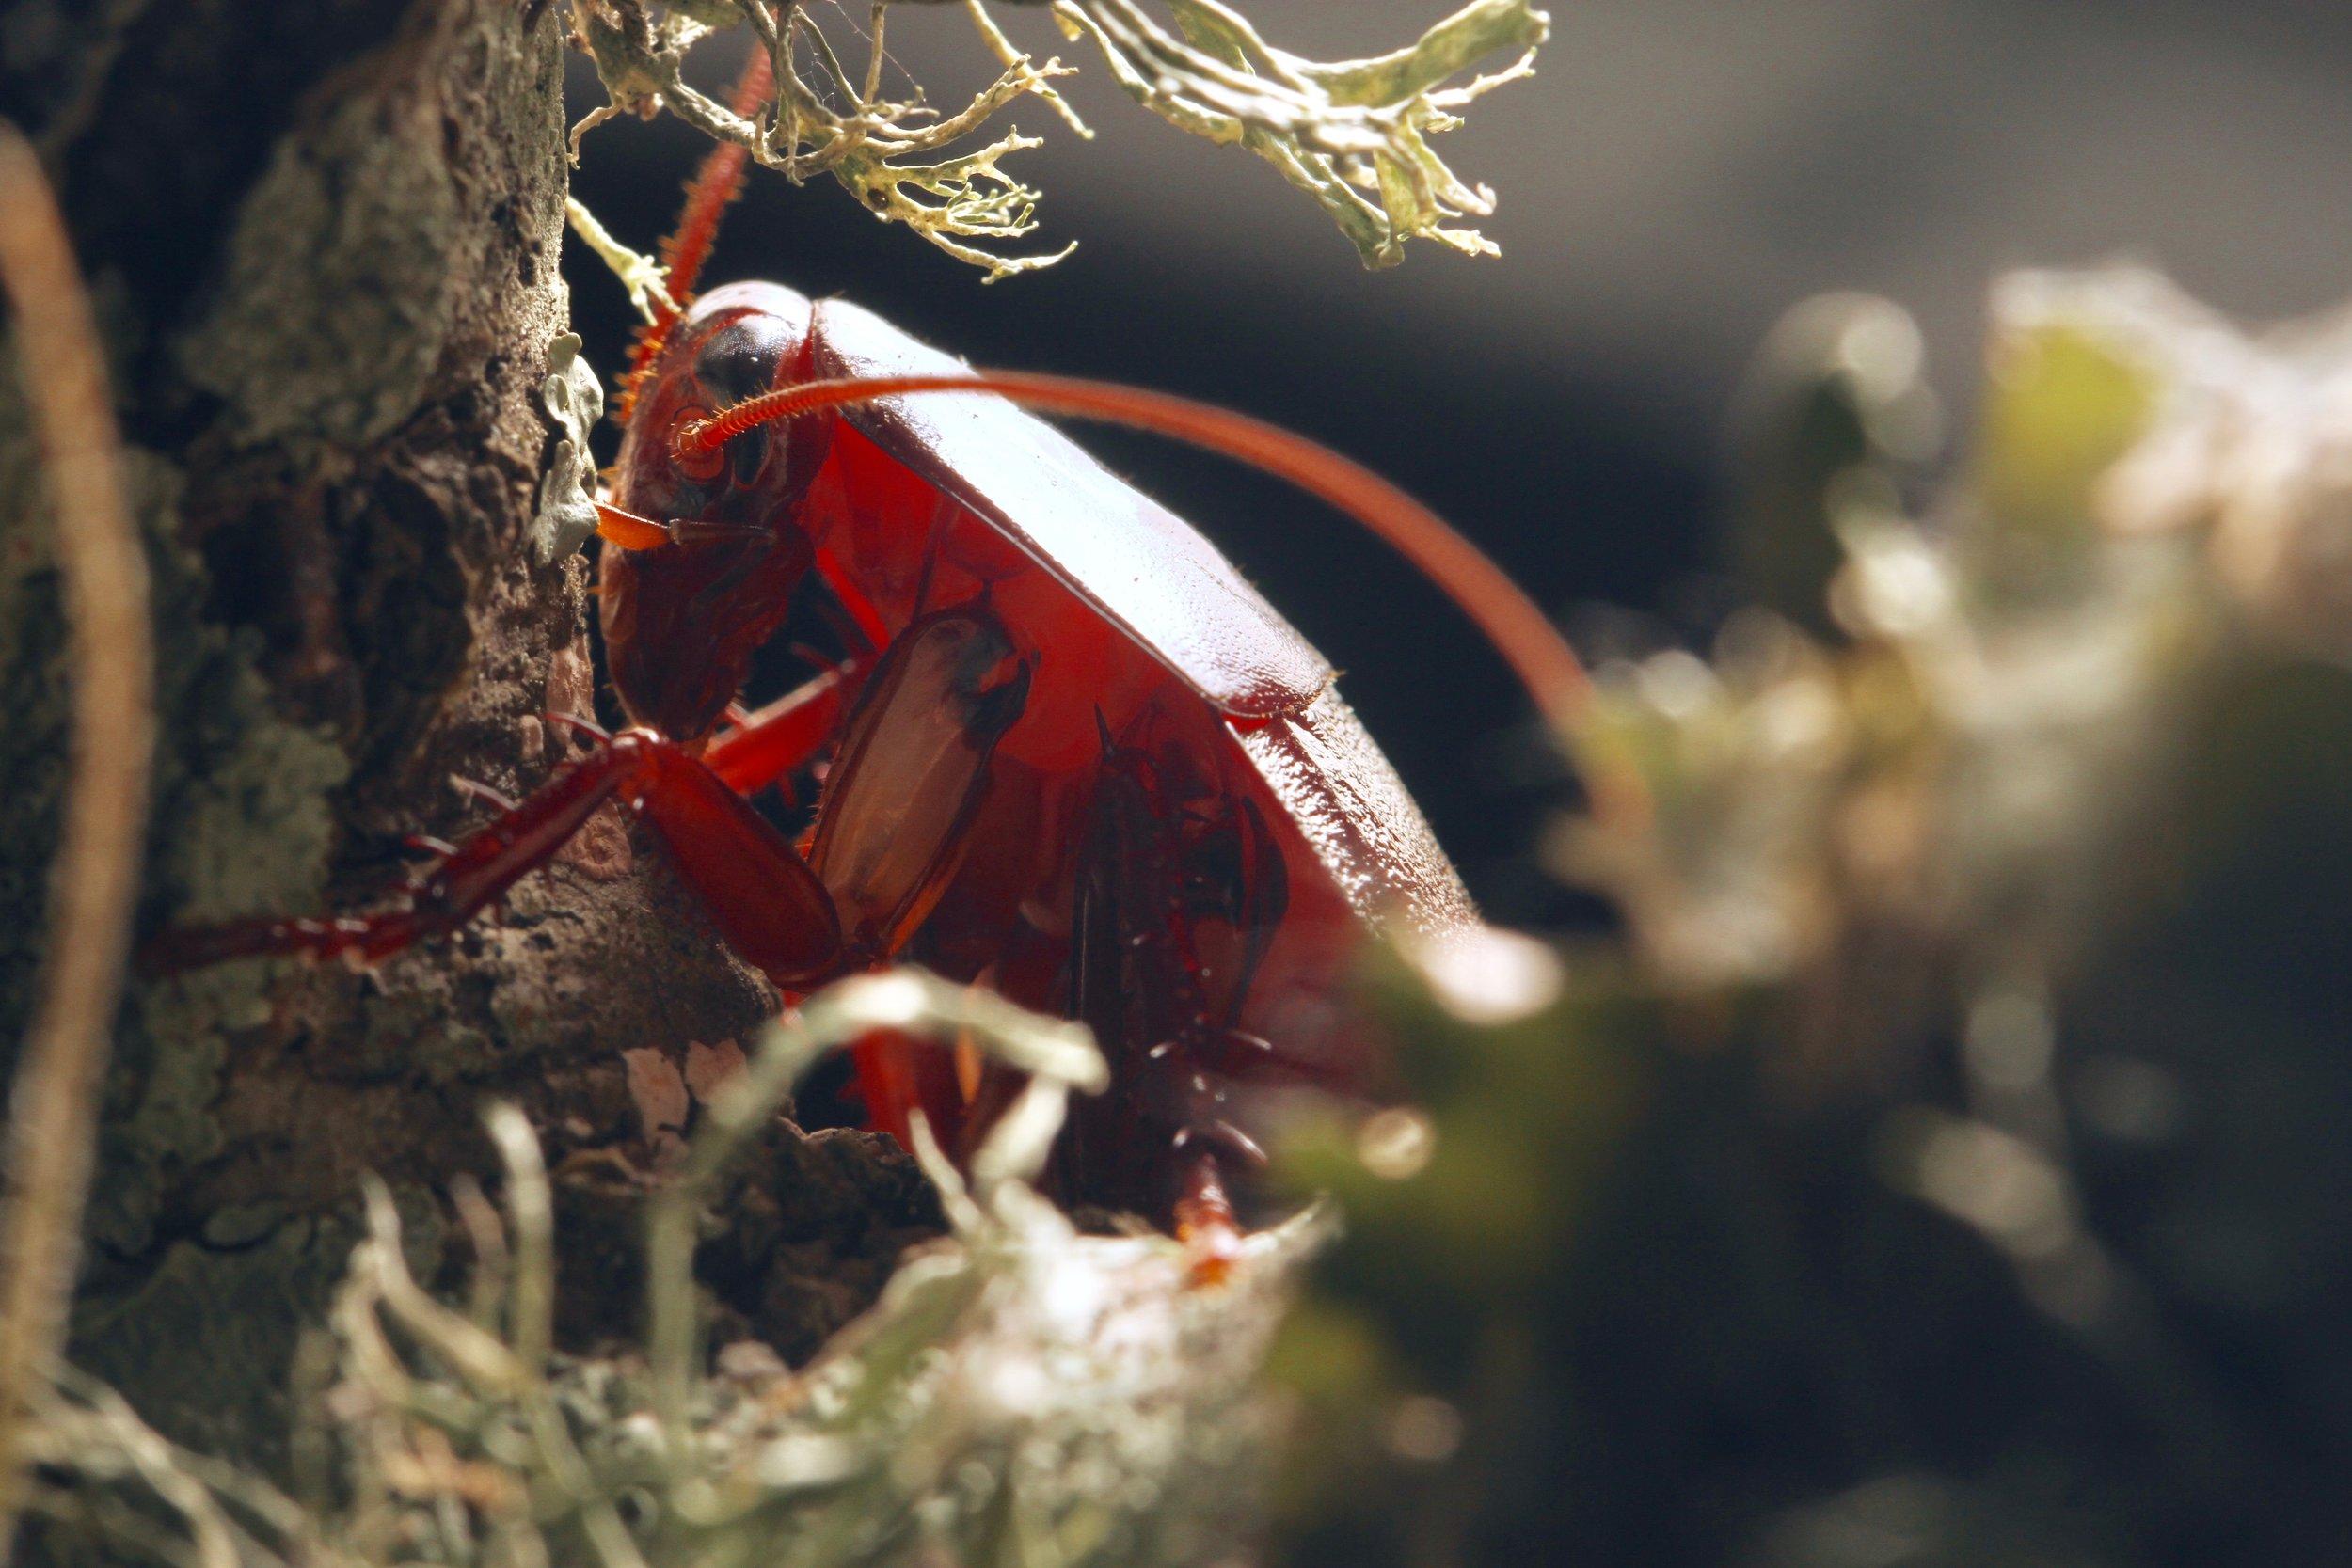 Invertebrates are wildlife. Wood cockroach photo by Chase Kimmel.